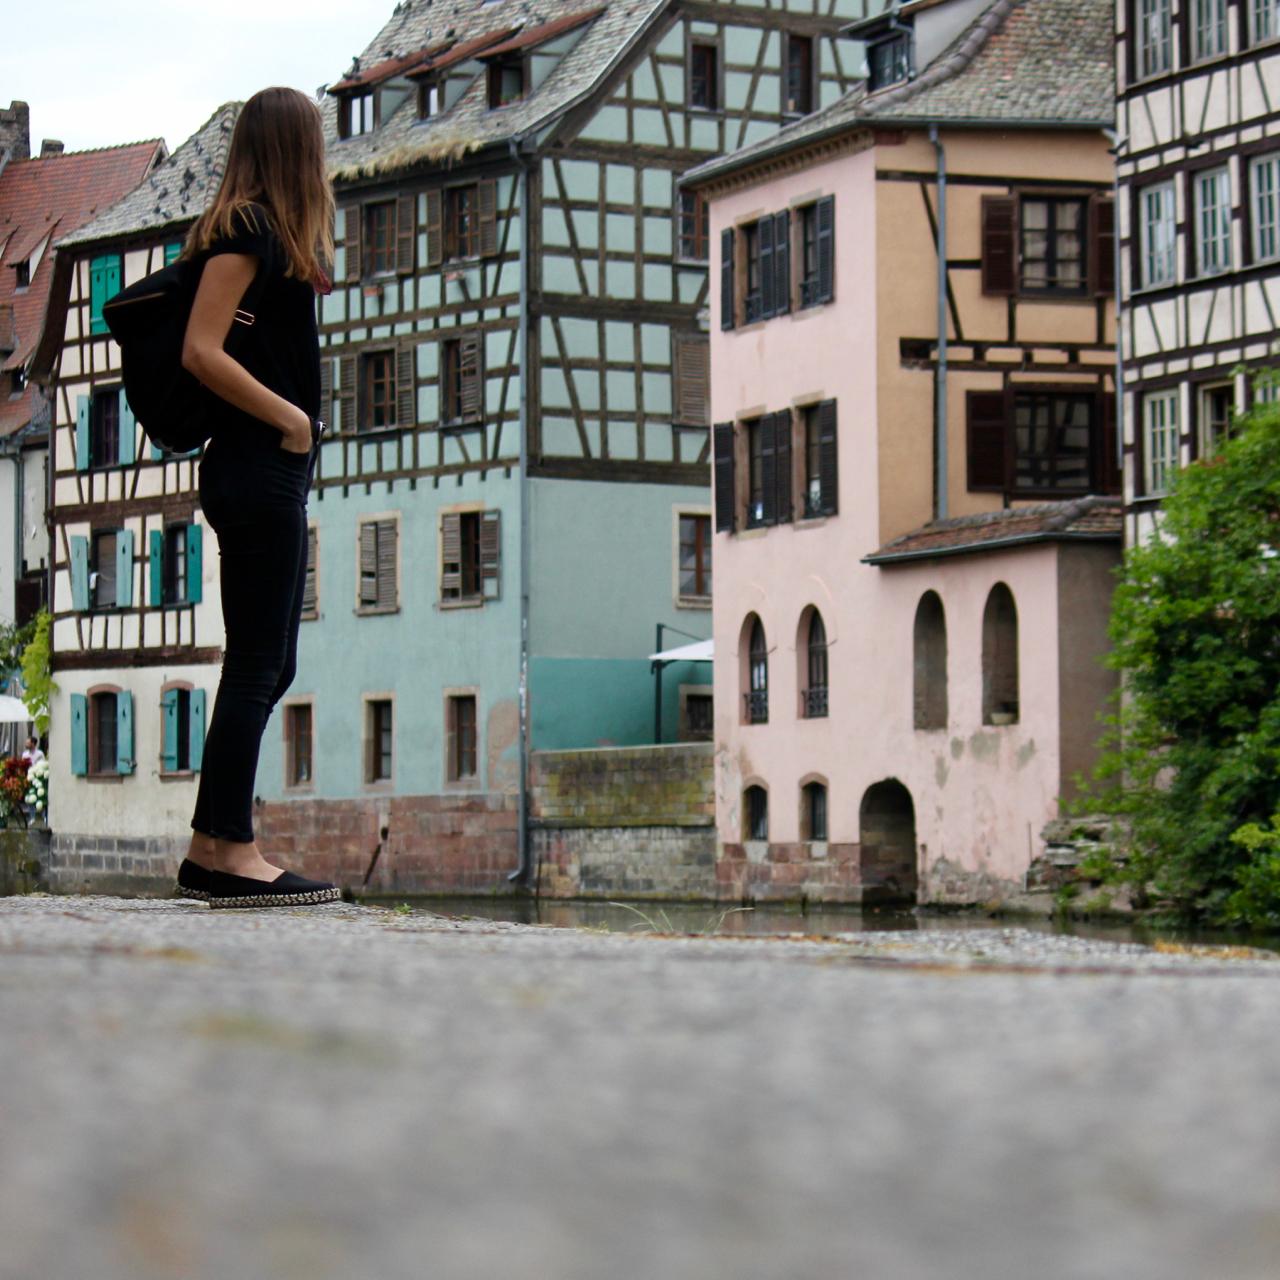 Strasbourg, France - 26